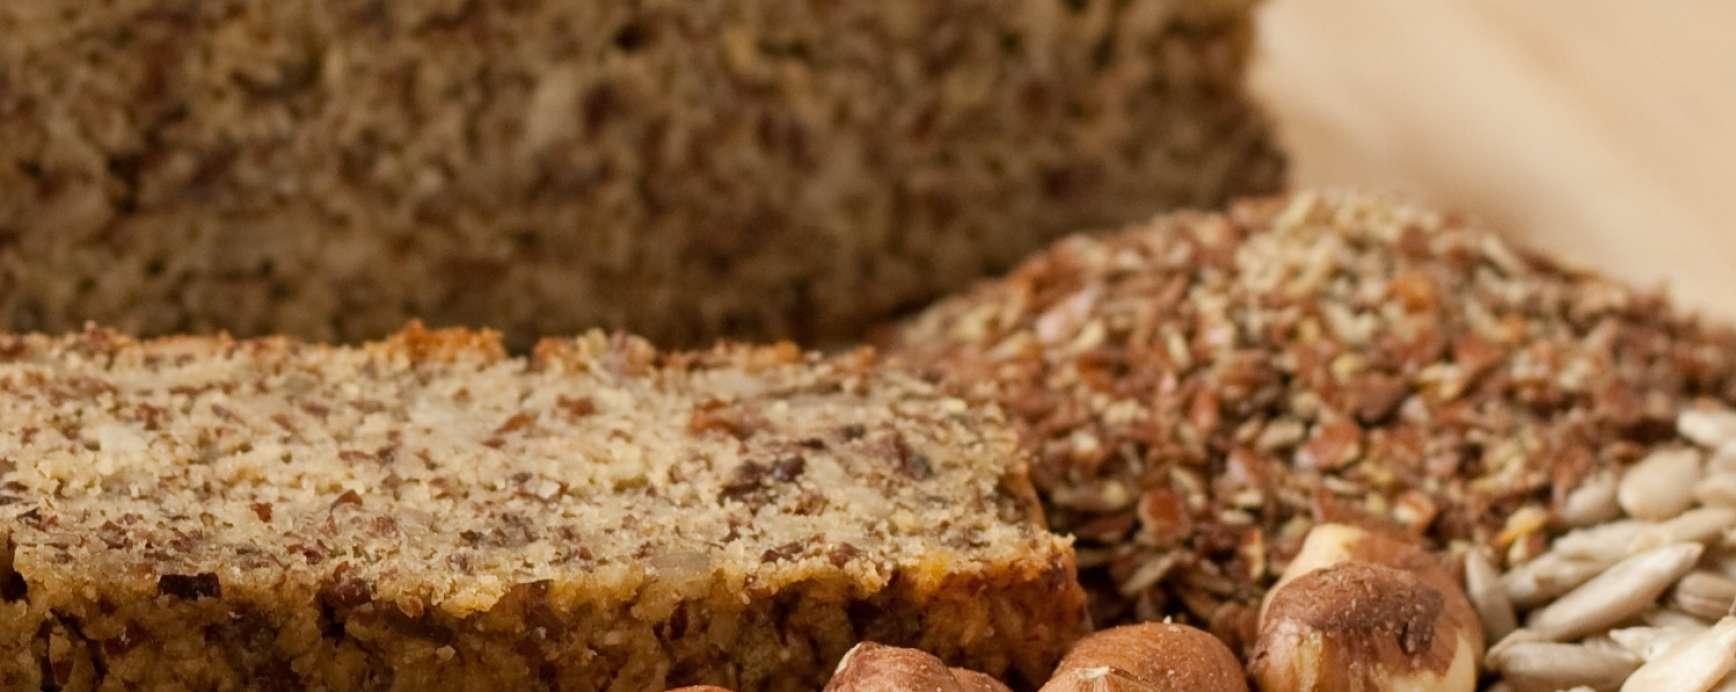 Amandelbrood of hazelnotenbrood